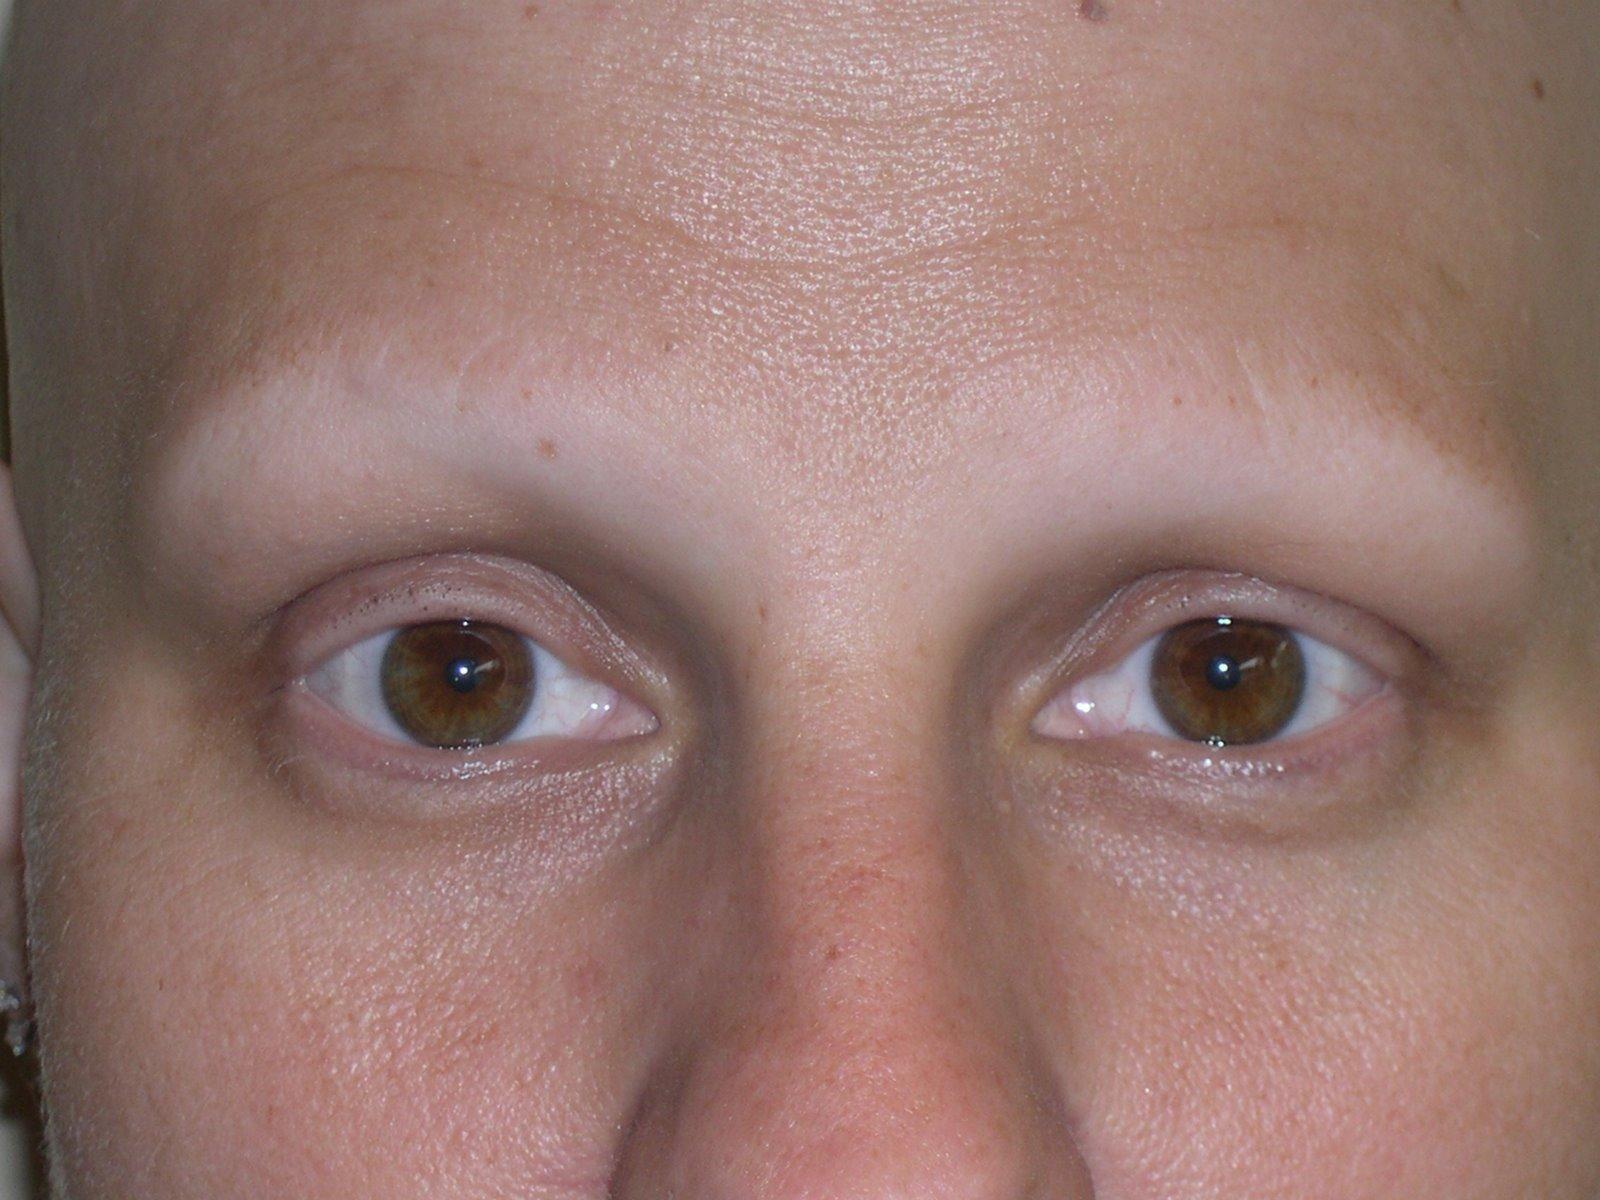 Alopecia Totali... Alopecia Areata Totalis